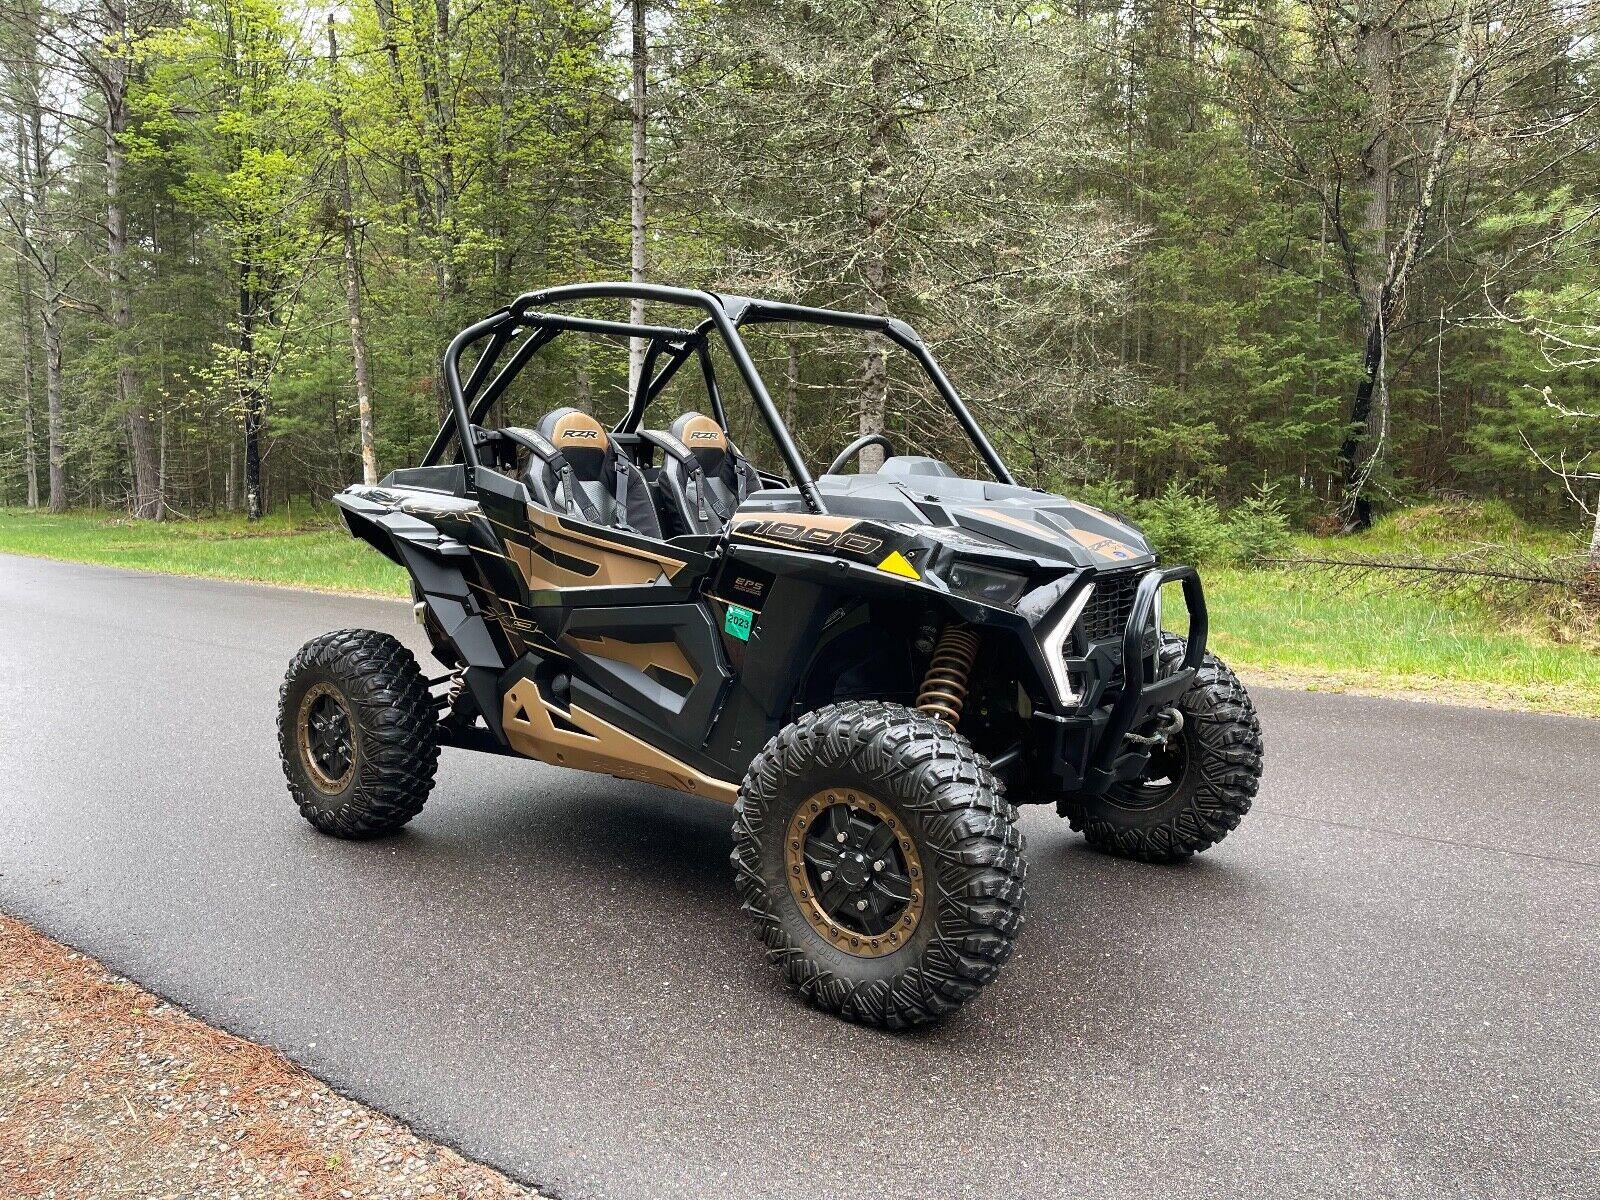 2019 Polaris Rzr XP 1000 Trail/Rocks Edition